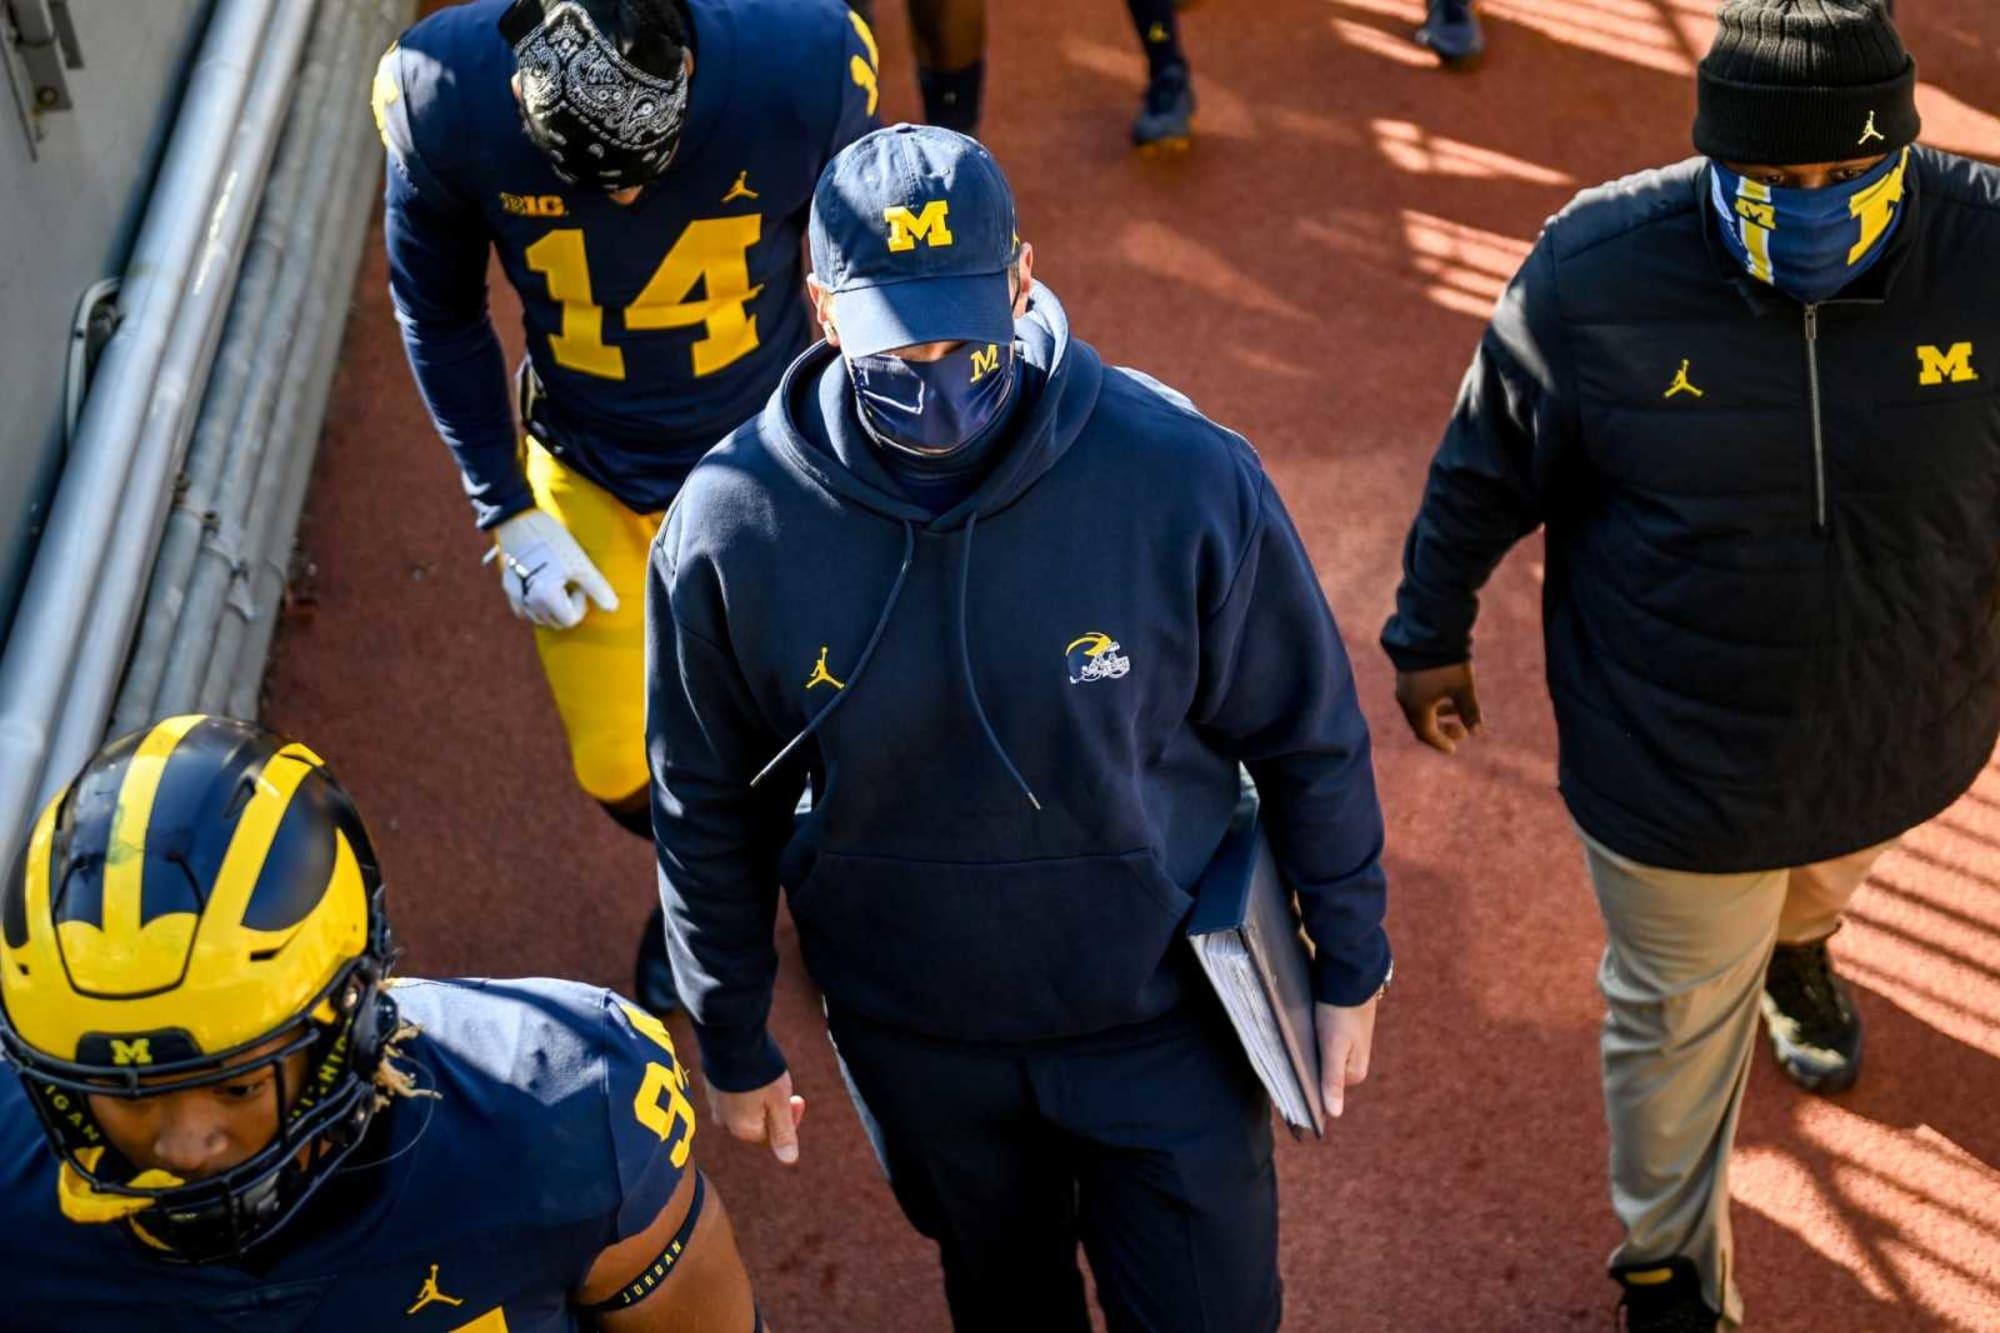 Jim Harbaugh gets flambéed on social media after Michigan chokes vs. Michigan State